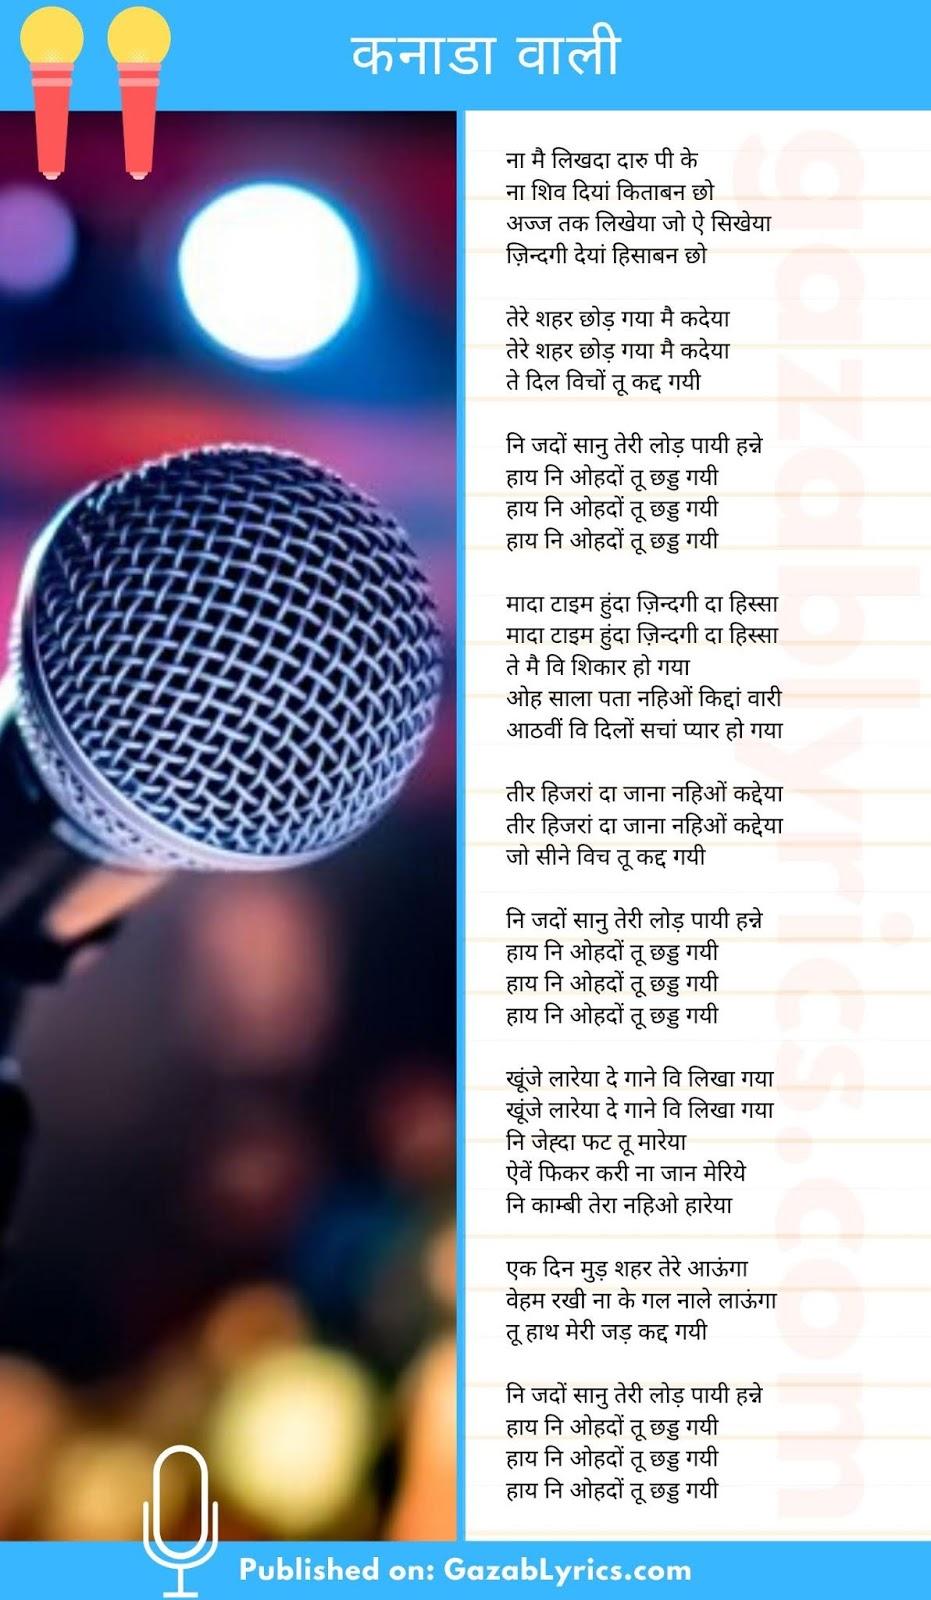 Canada Wali song lyrics image